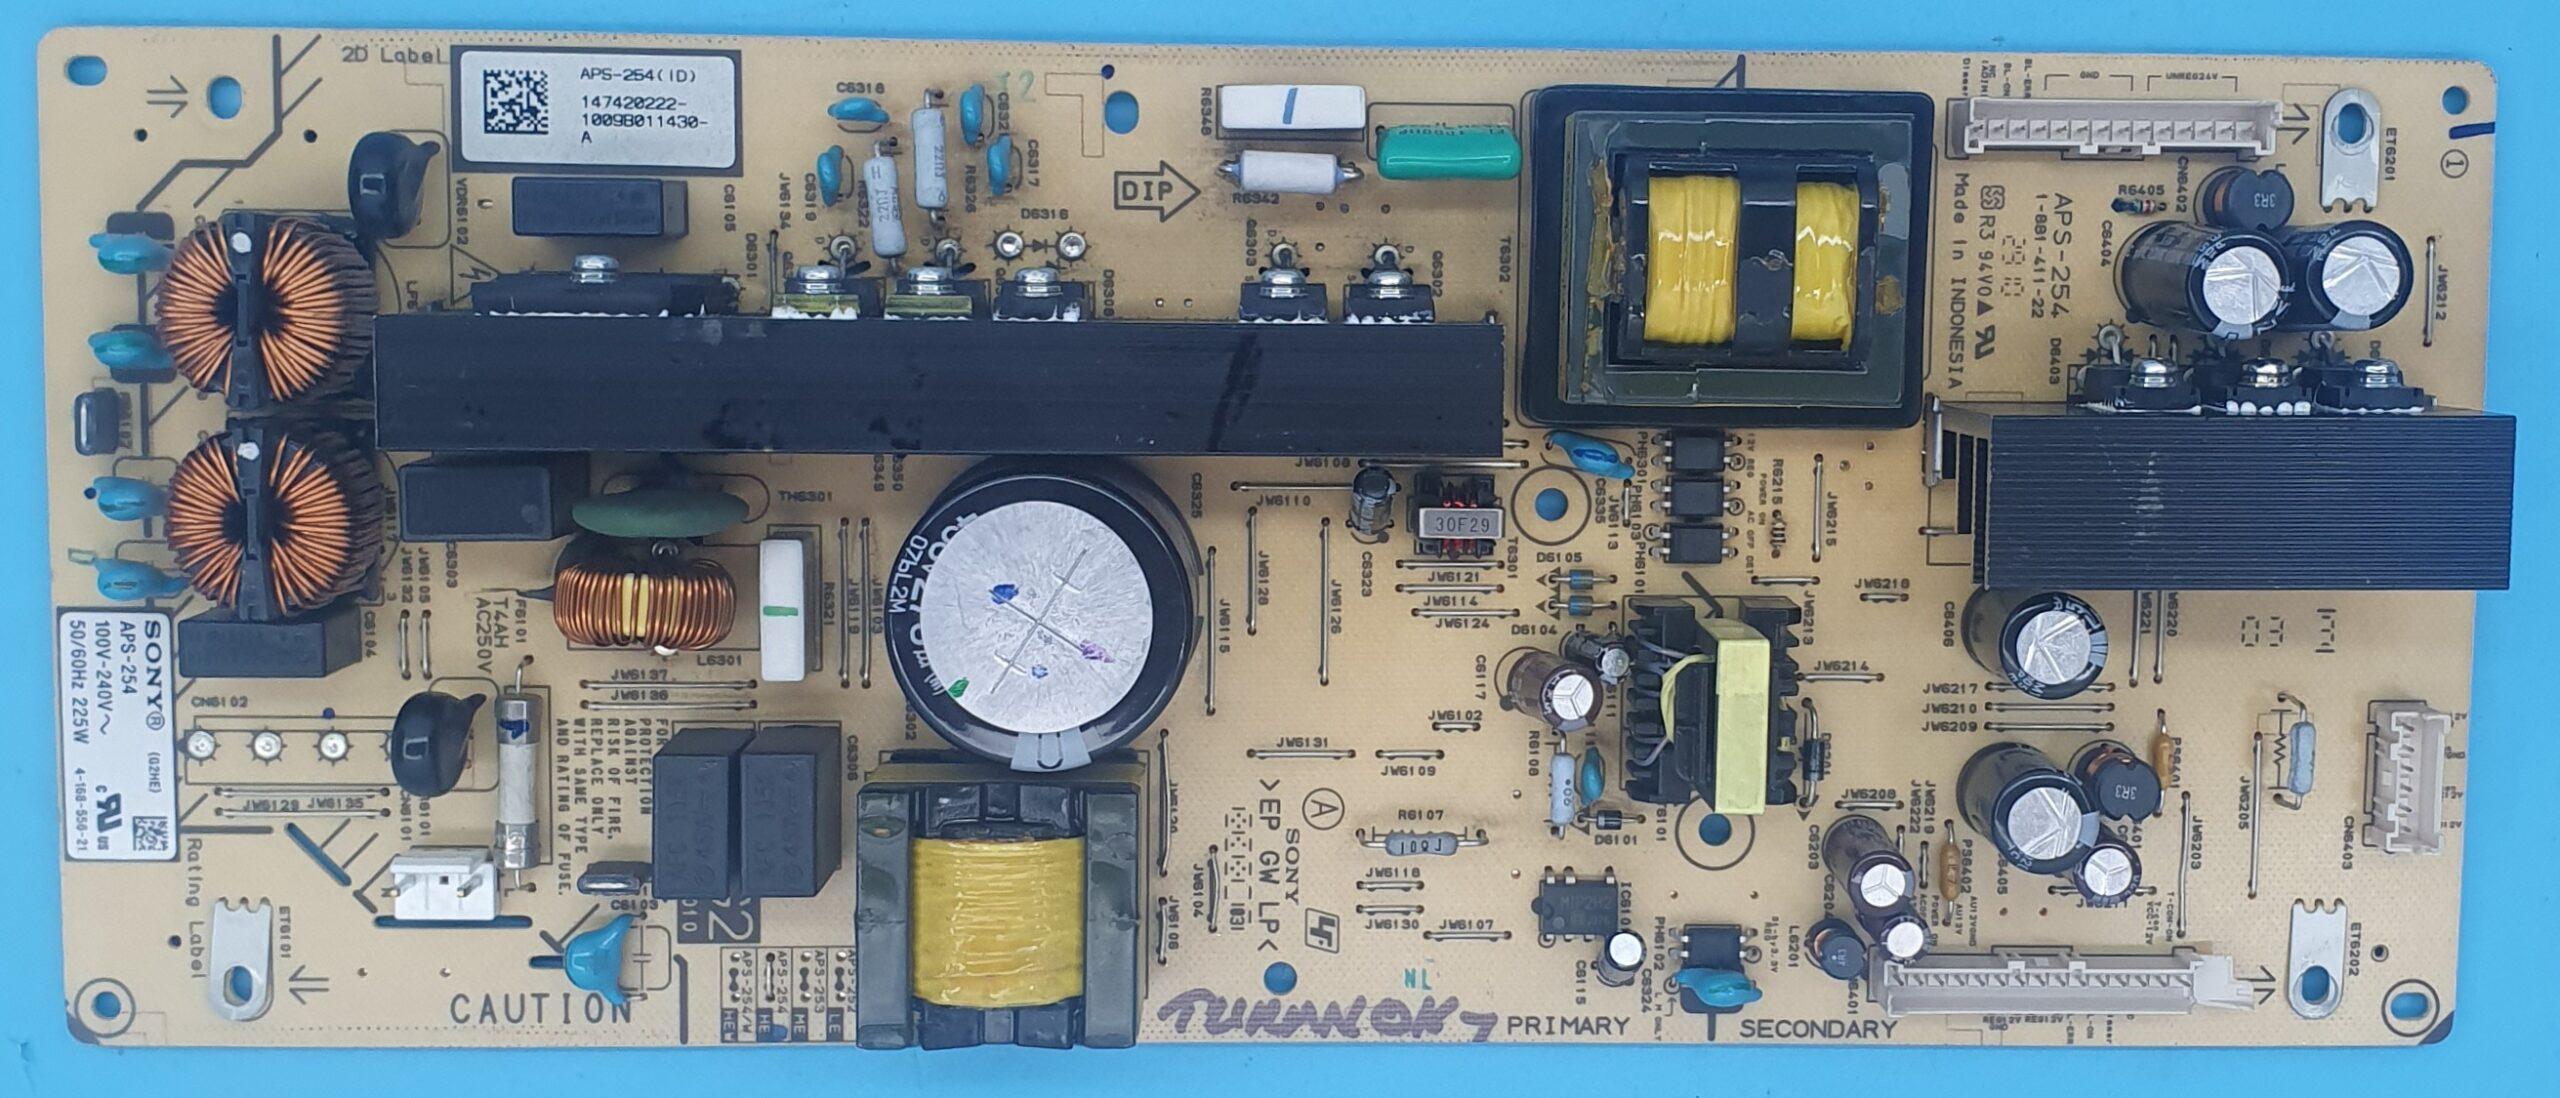 APS-254,147420222 Sony Power (KDV DAHİL = 130 TL)